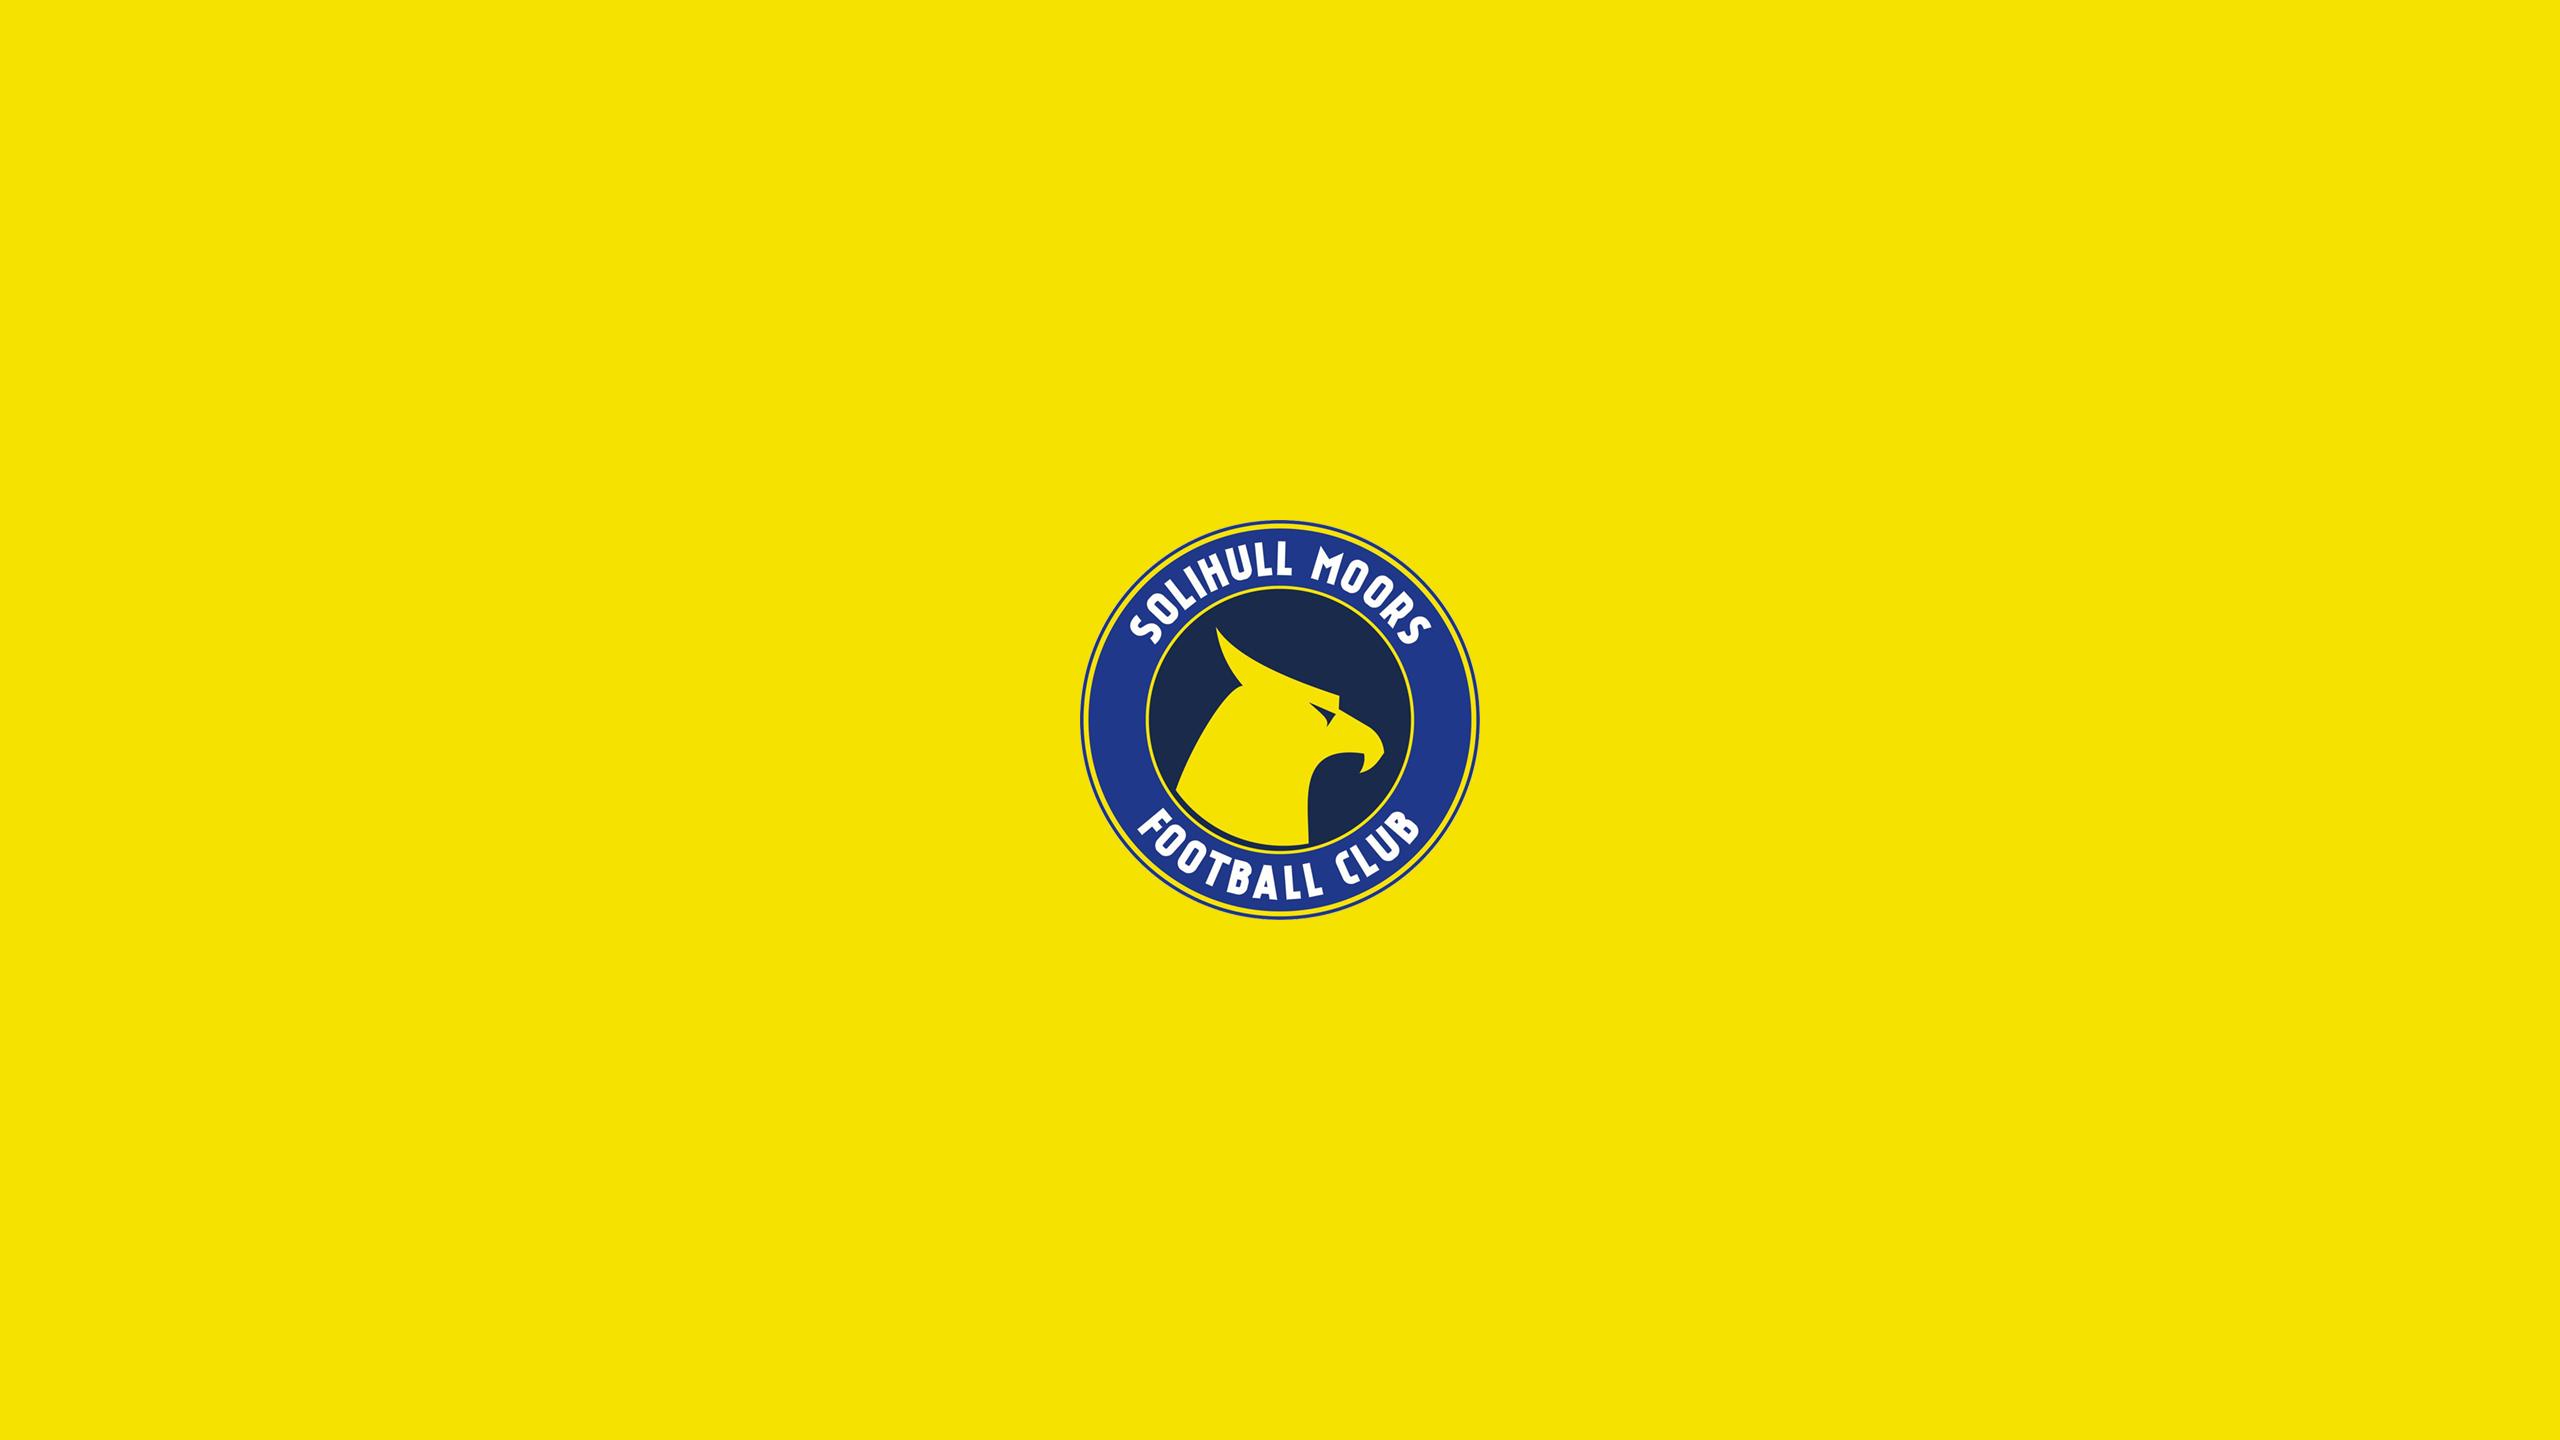 Solihill Moors FC